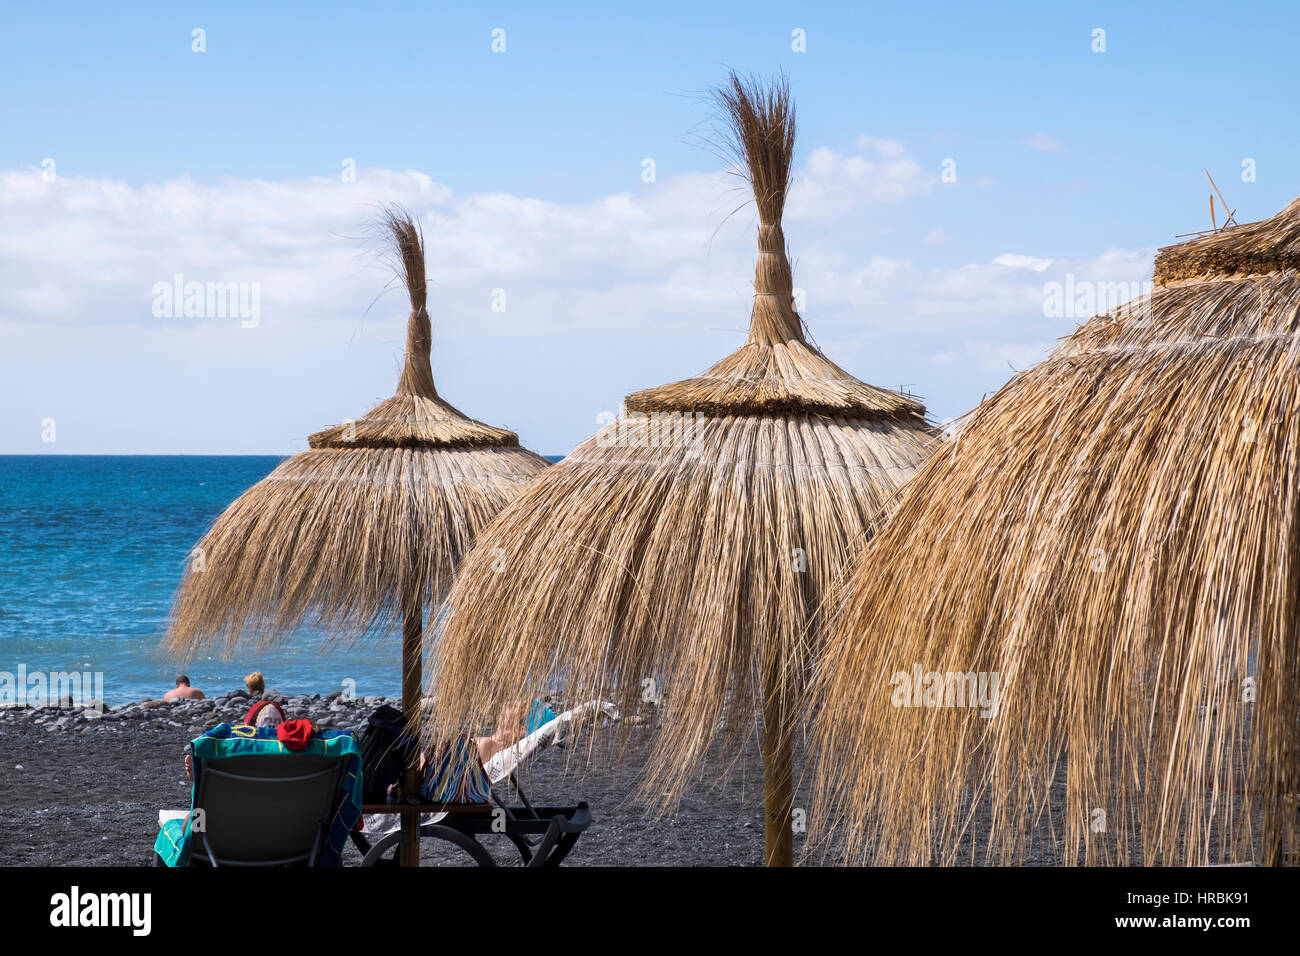 straw-sunshade-umbrellas-on-the-beach-of